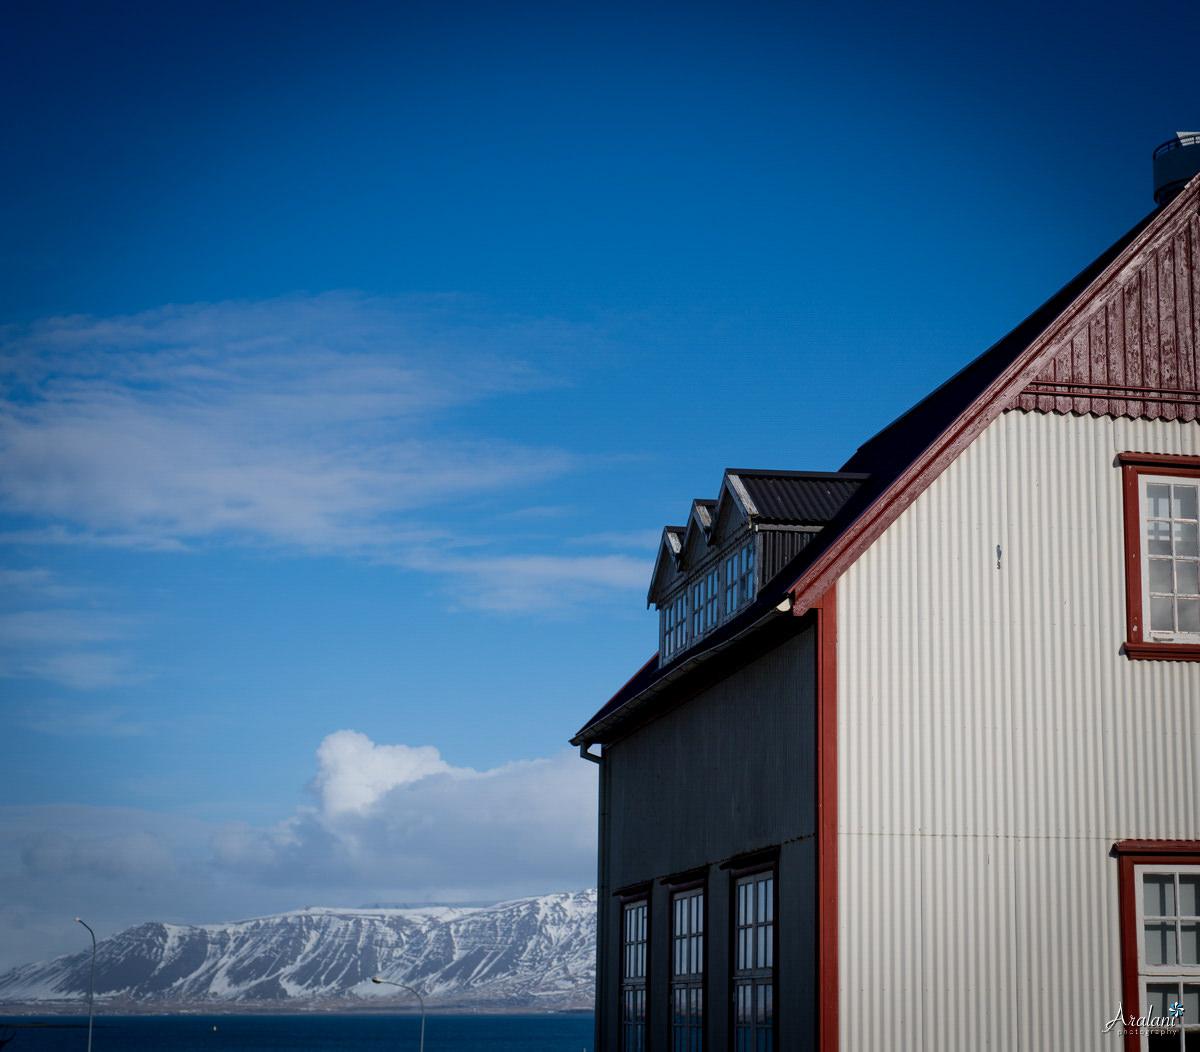 Iceland_Aralani0002.jpg